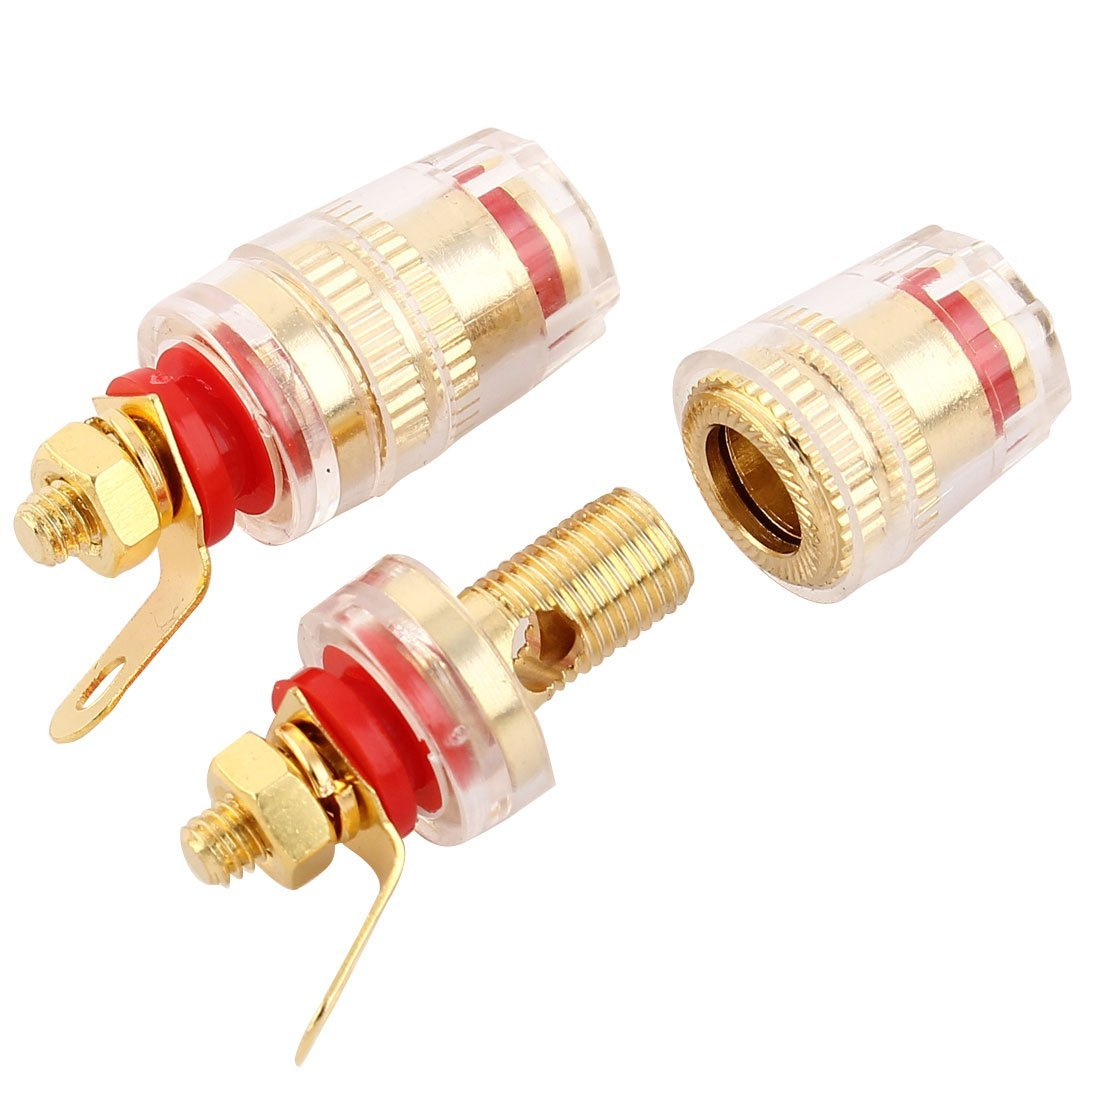 eDealMax cobre Binding Post oro Rojo DE 10 PCS tono de Audio del altavoz del conector de plátano by eDealMax